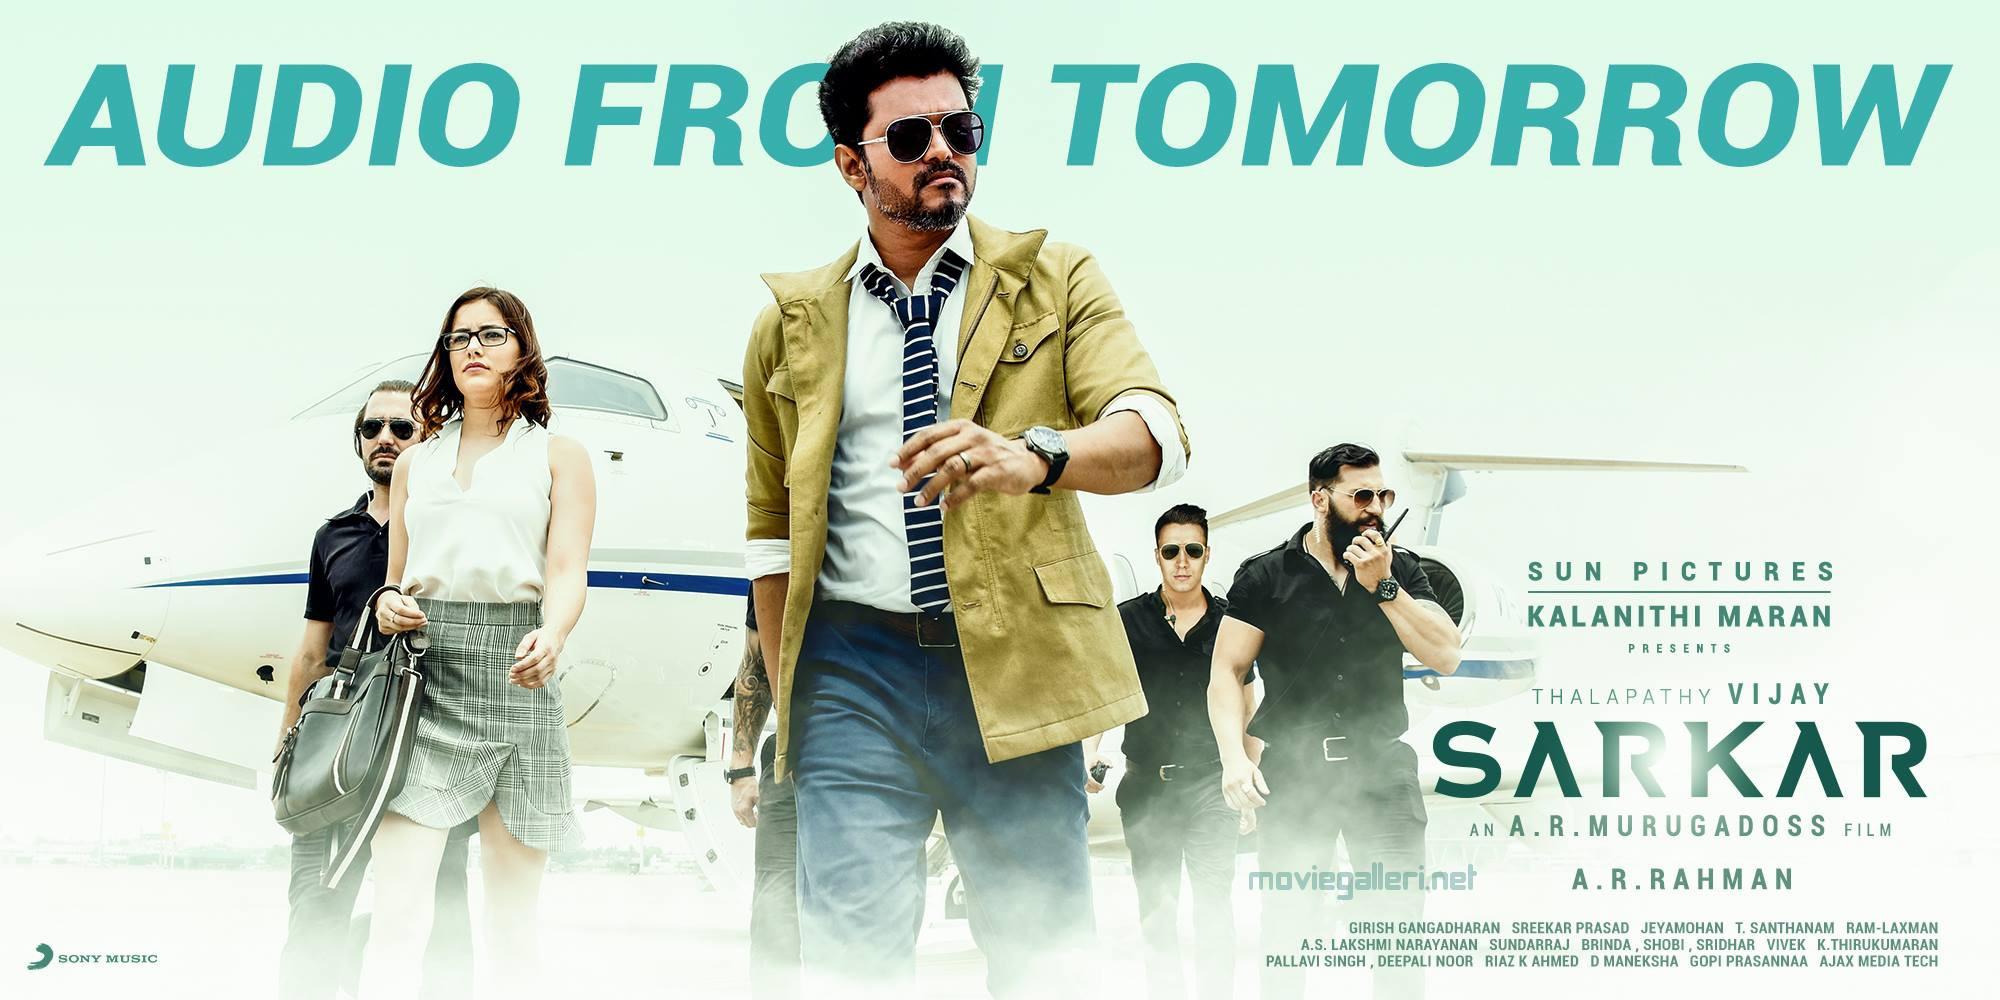 Vijay Sarkar Audio Launch Tomorrow Wallpaper HD